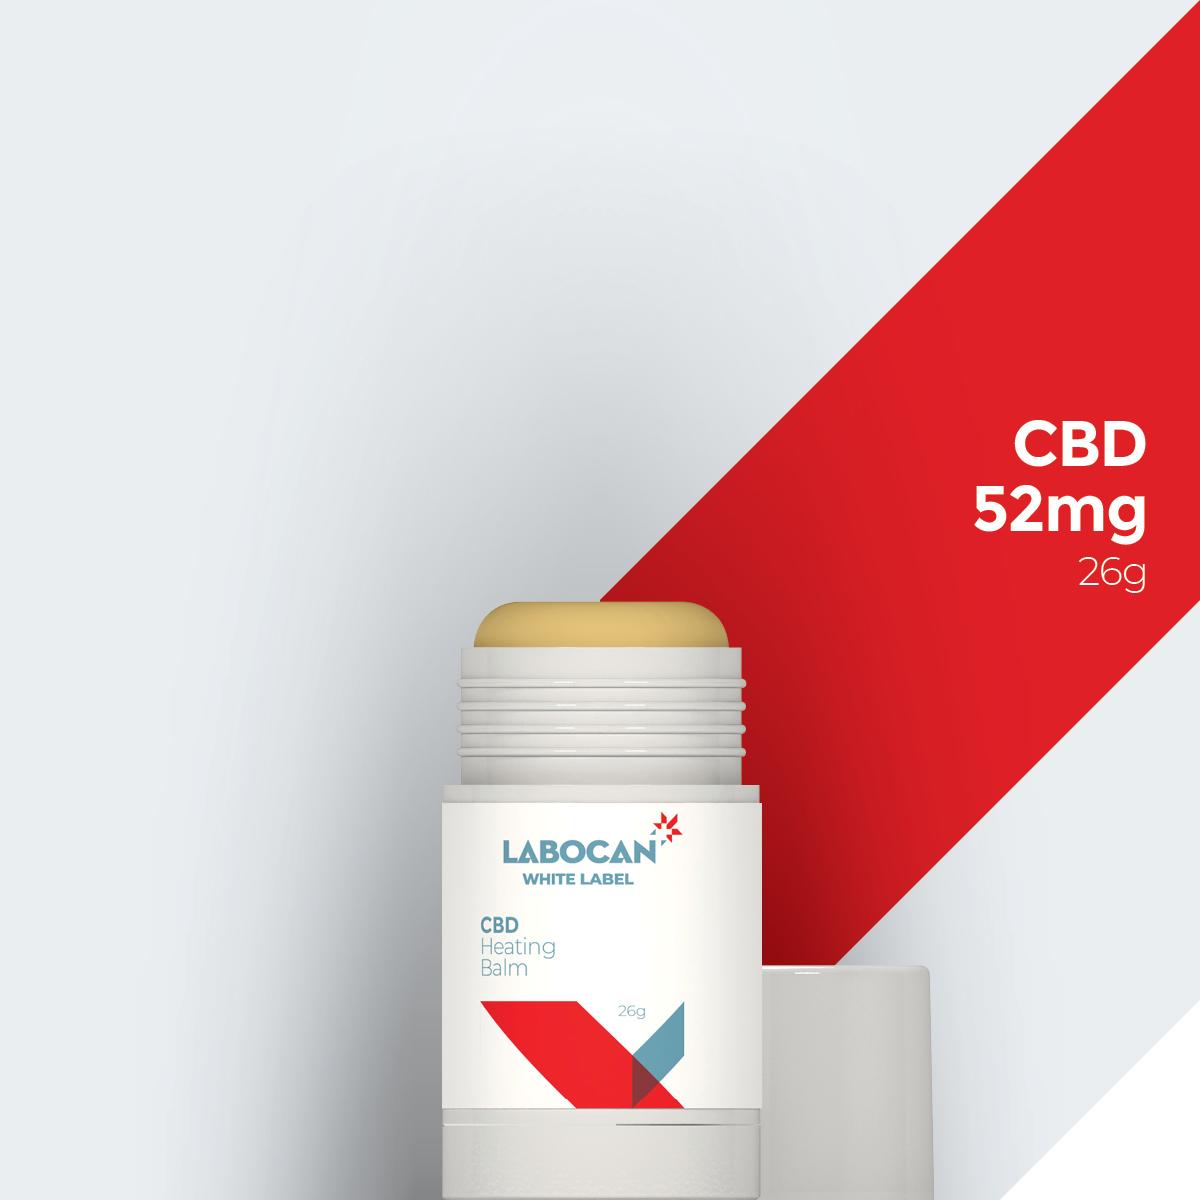 Labocan White Label CBD heating balm